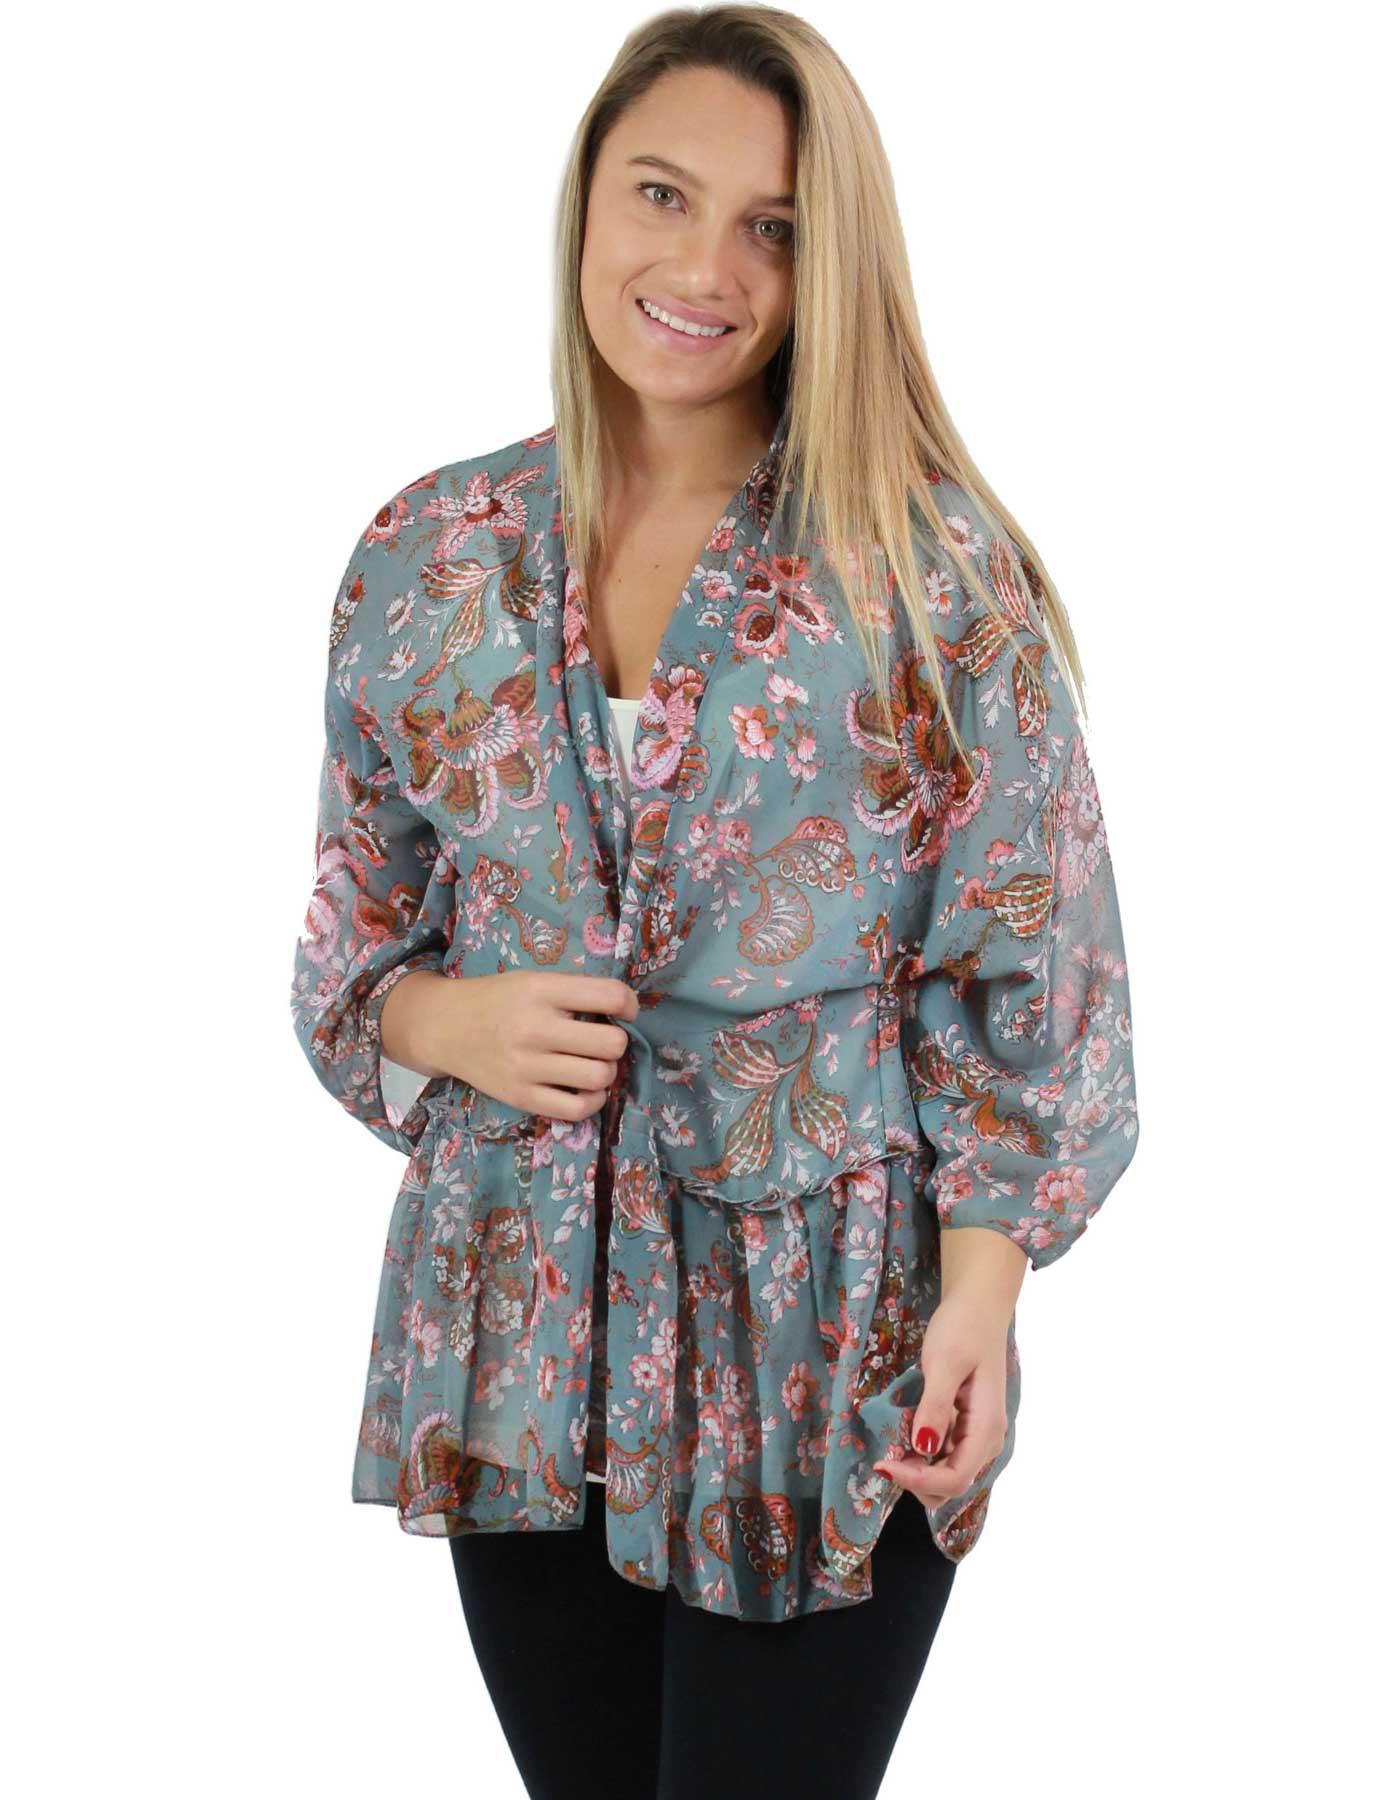 Chiffon Kimono - Ruffled Flower Print 1256